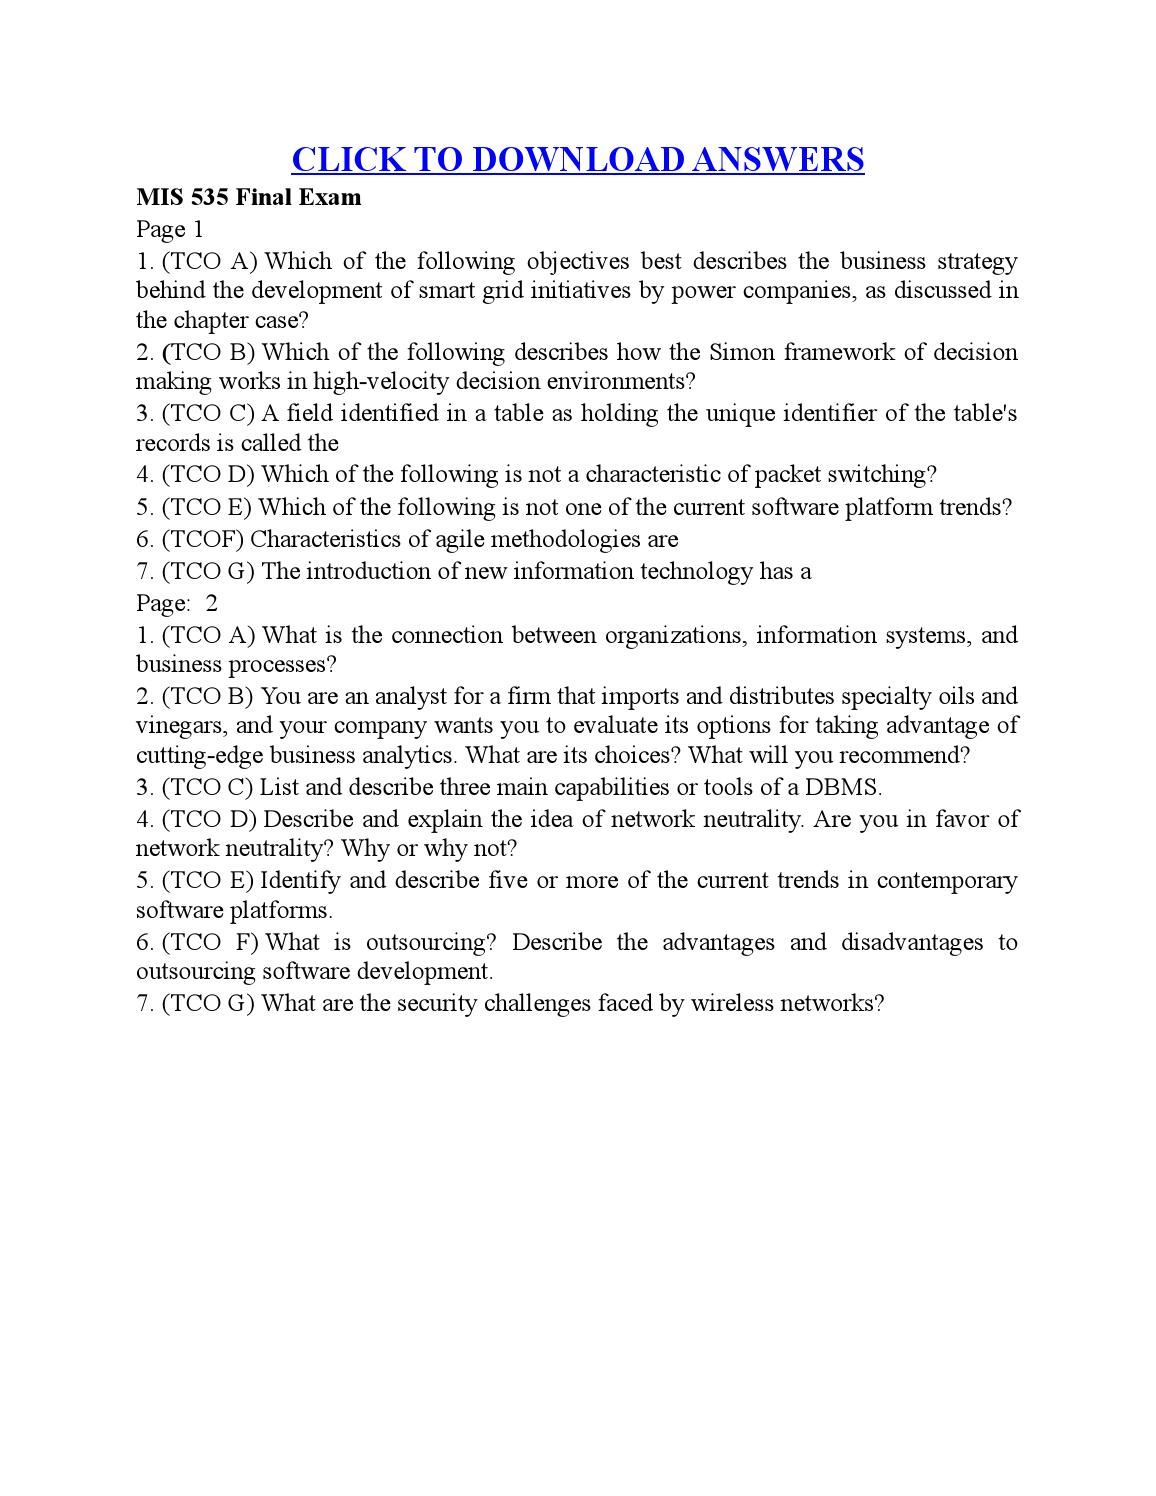 ACC 491 Week 1 DQ 2 Answer